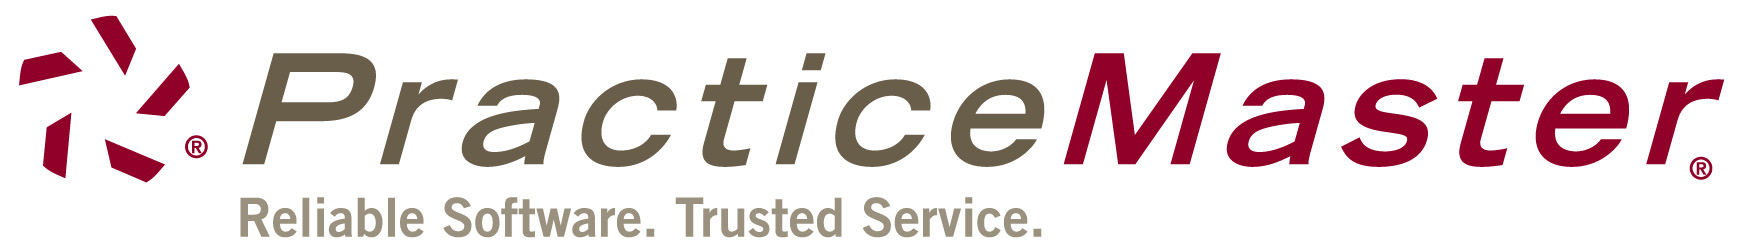 PracticeMaster: award-winning practice management software